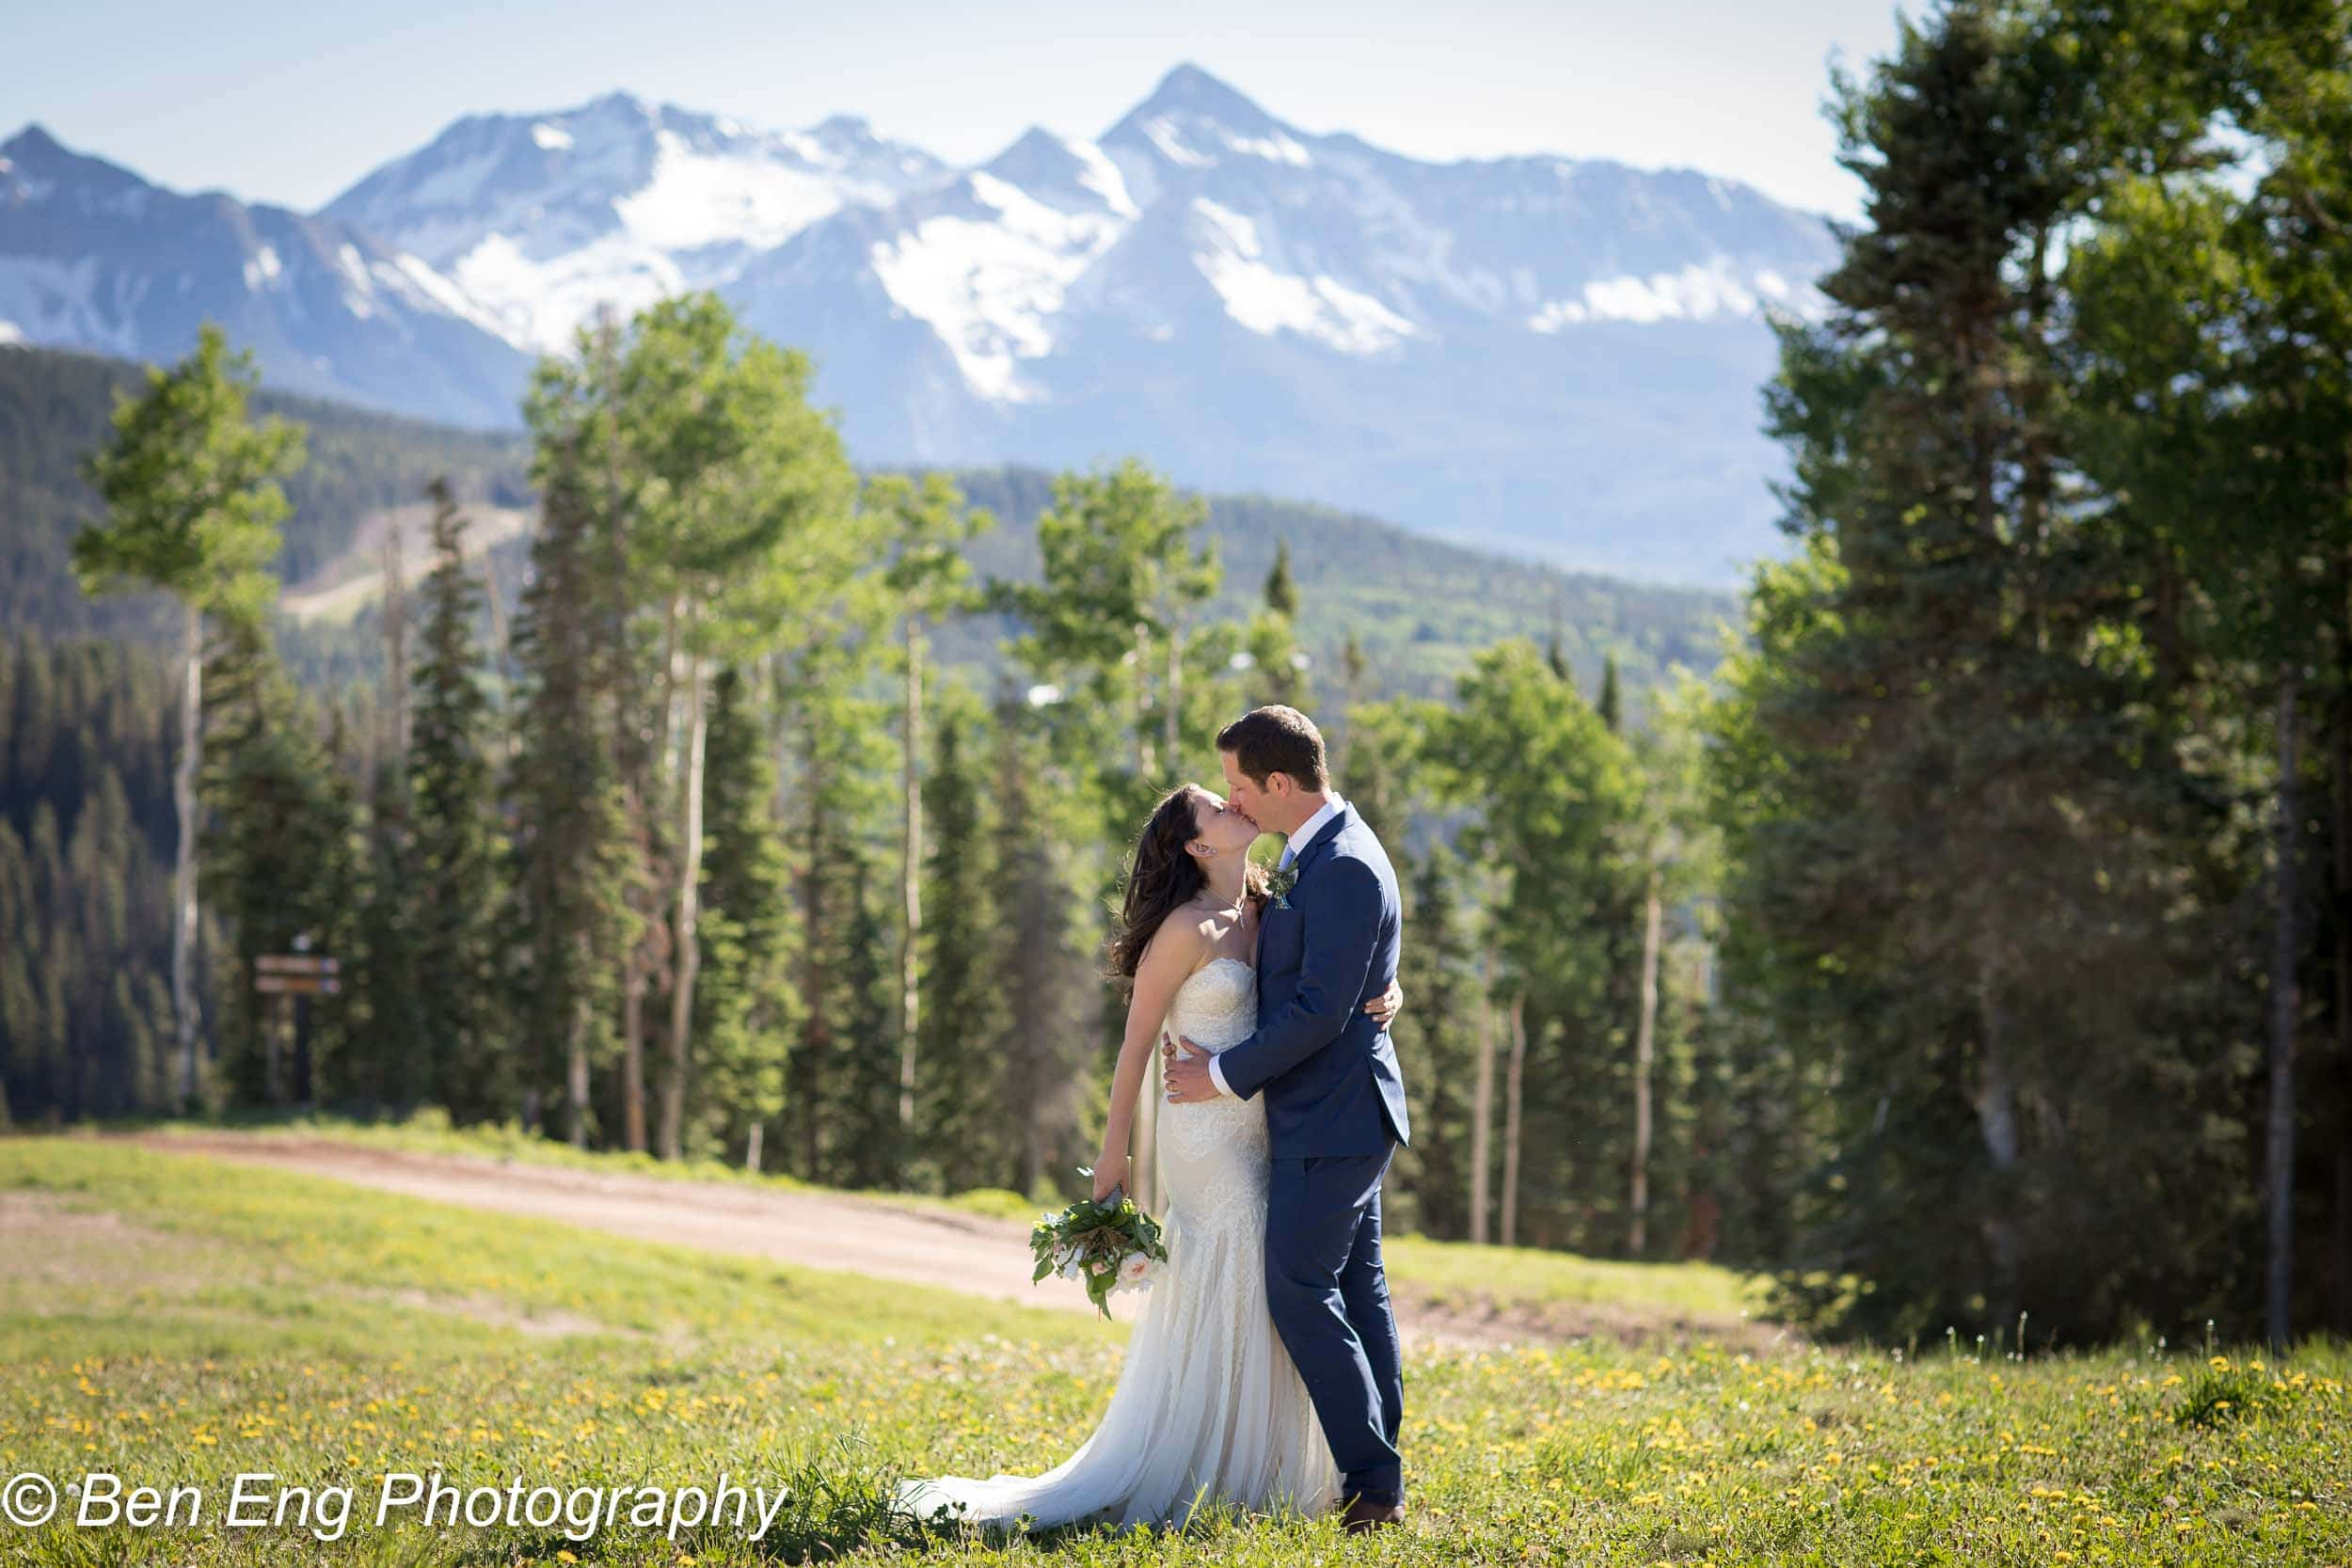 Beautiful rustic mountain wedding at the San Sophia Overlook in Telluride, Colorado.